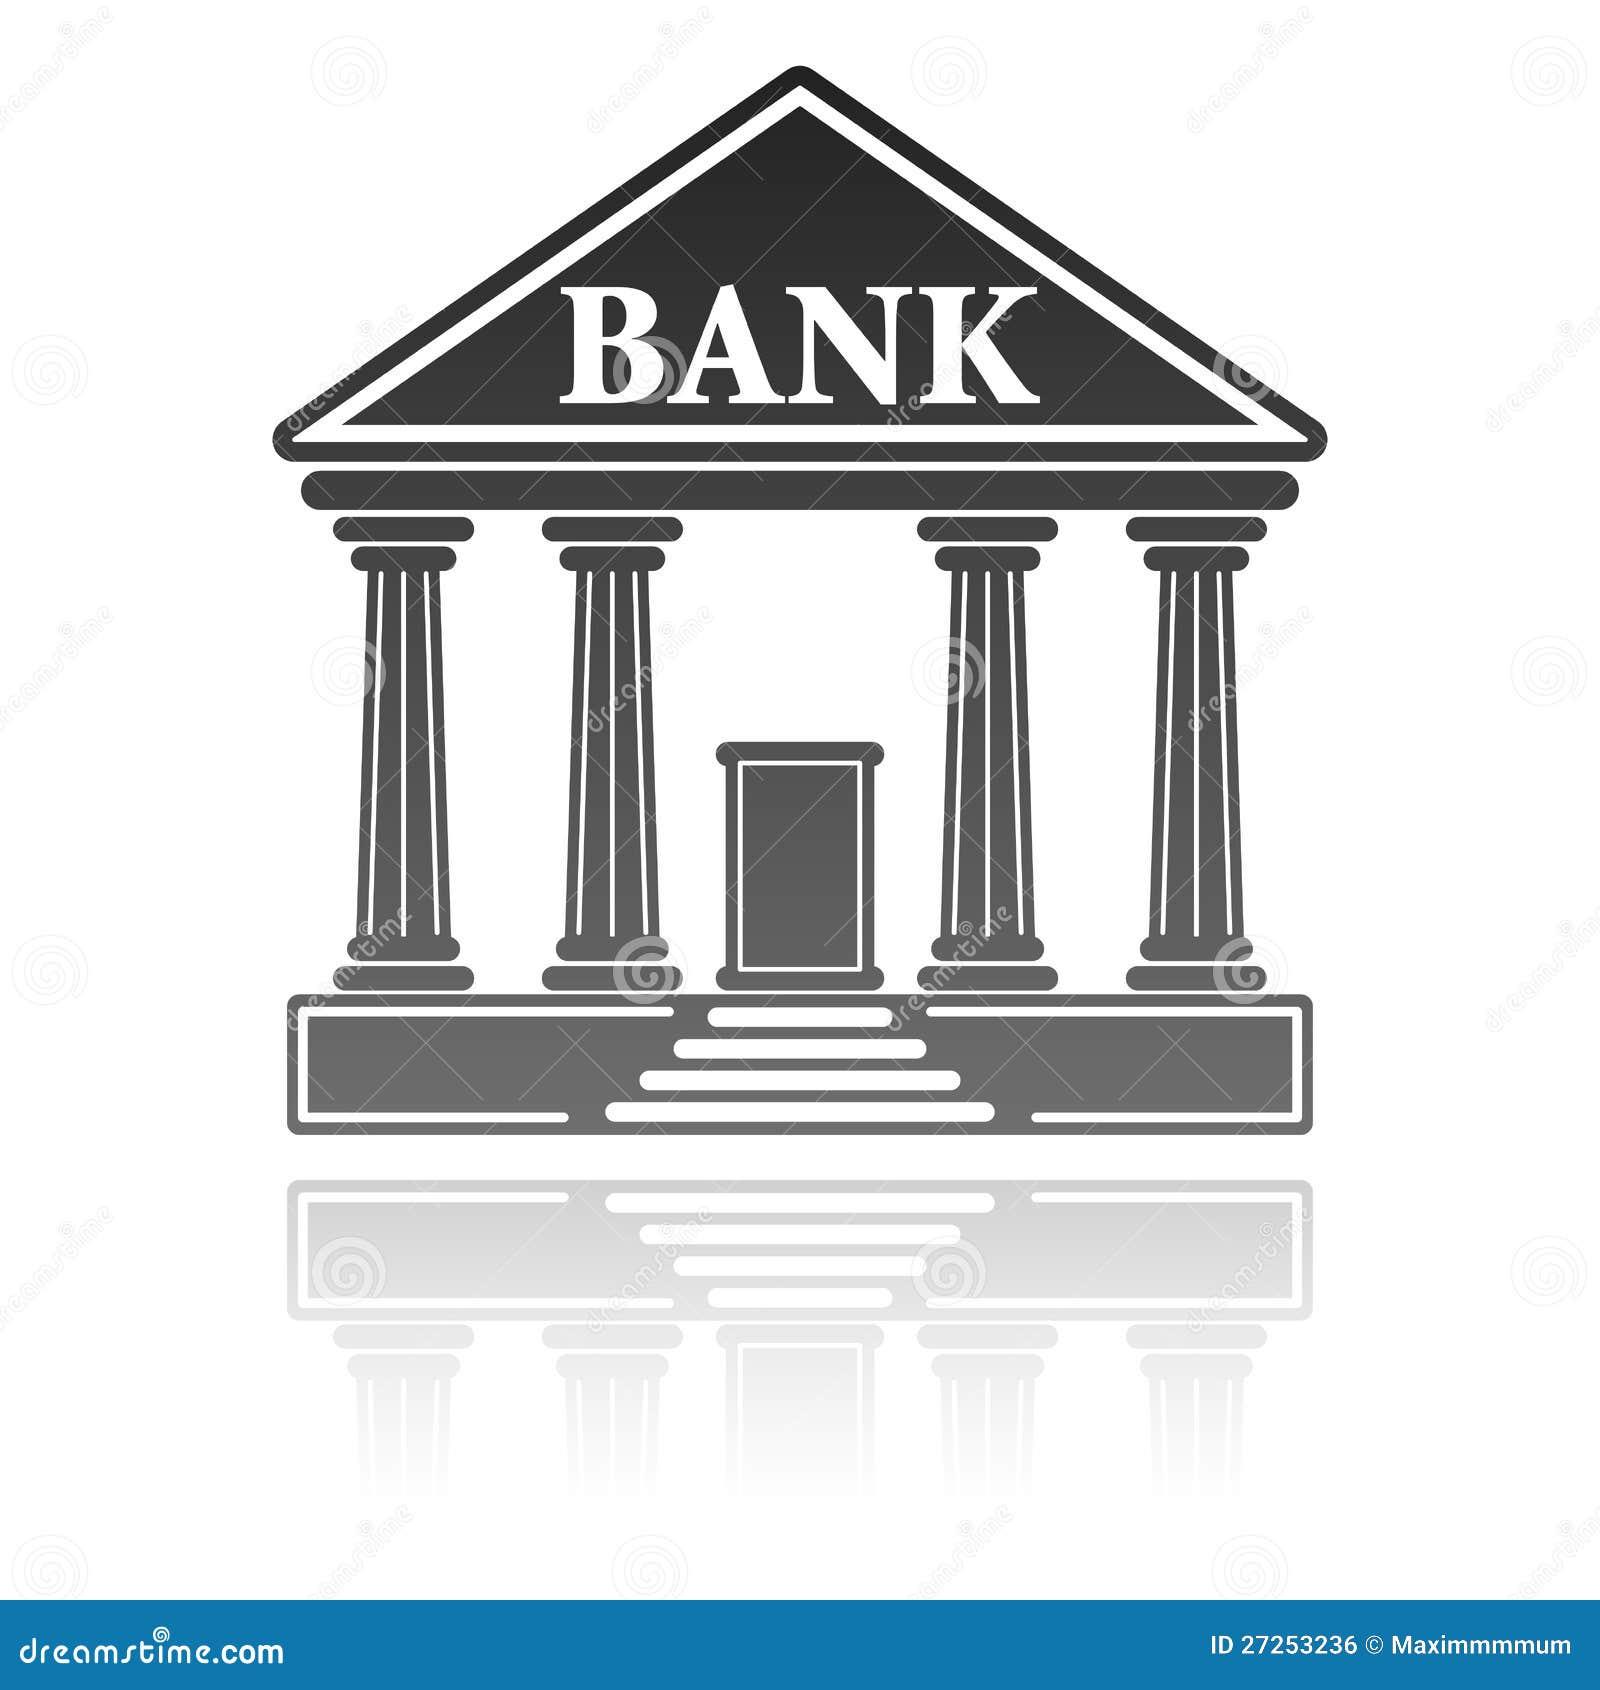 bank customer clipart - photo #39